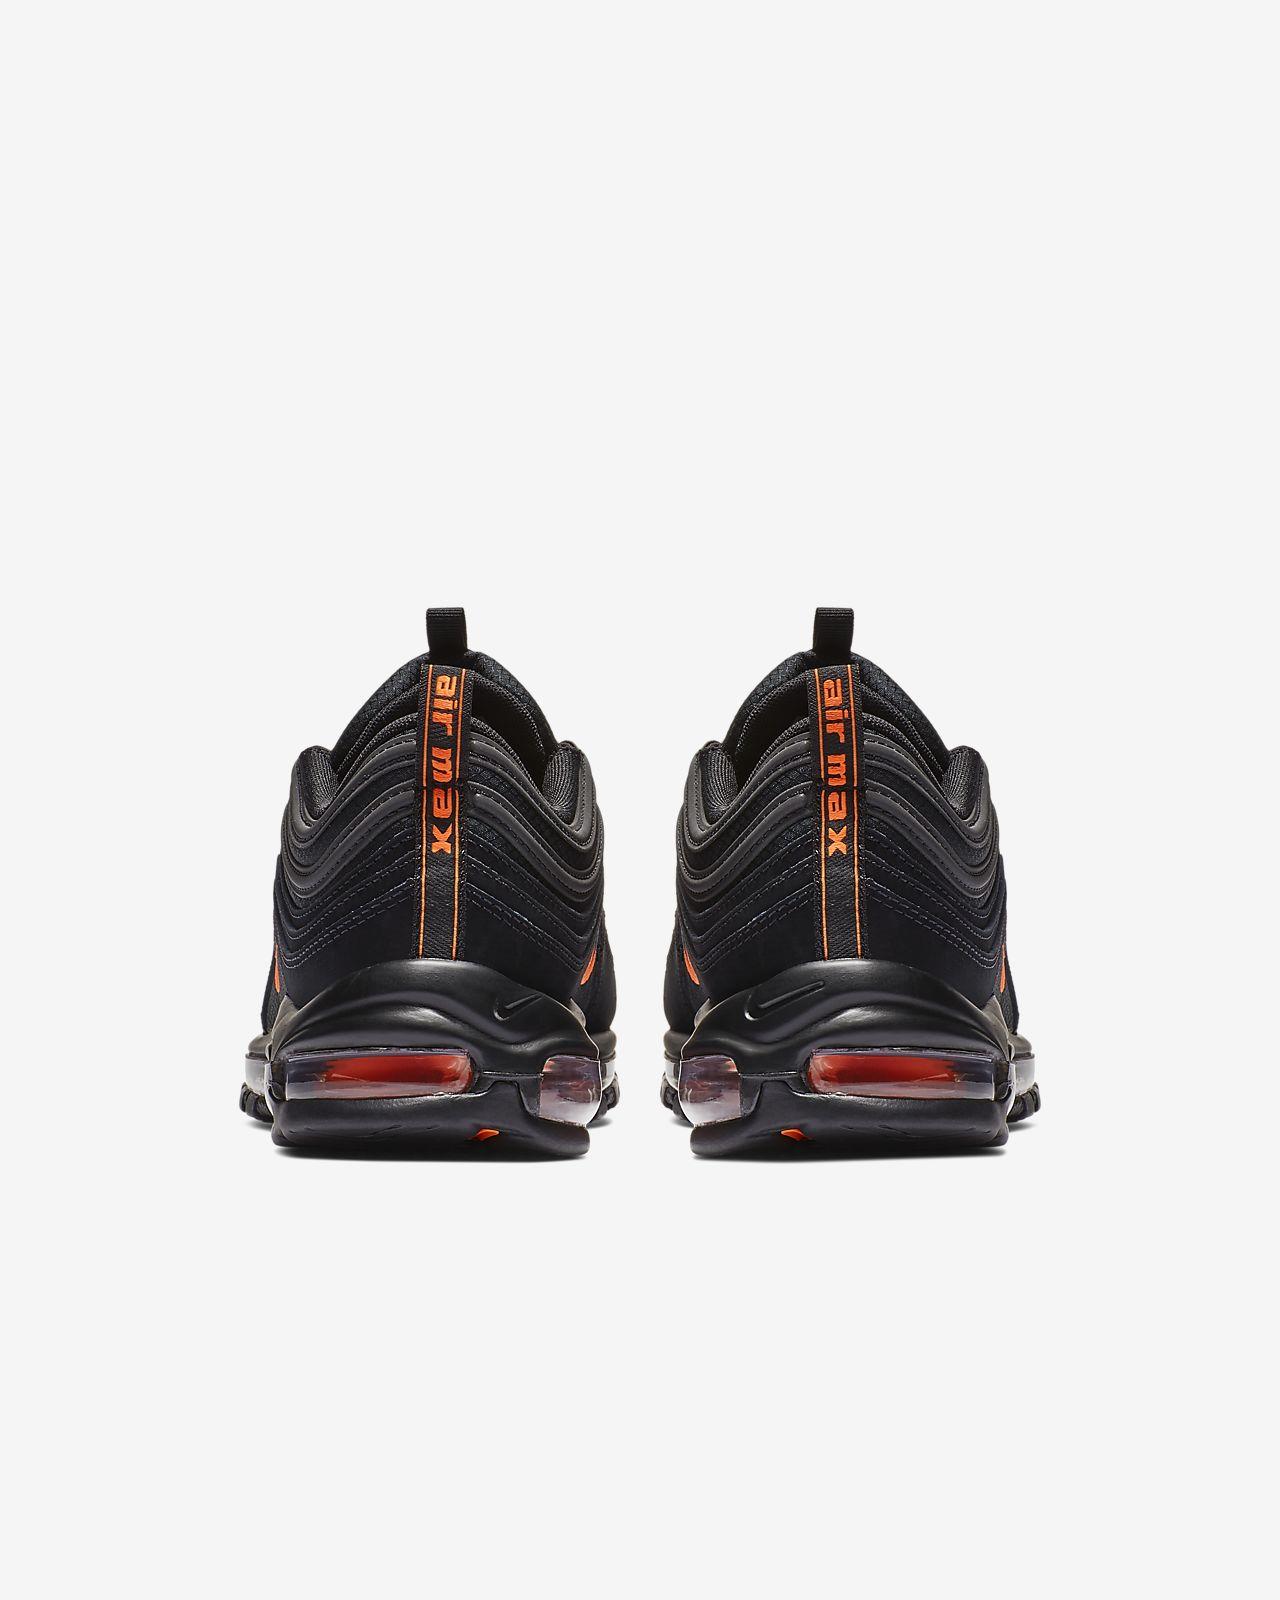 separation shoes 4e170 5b0b1 Nike Air Max 97 Men's Shoe. Nike.com FI